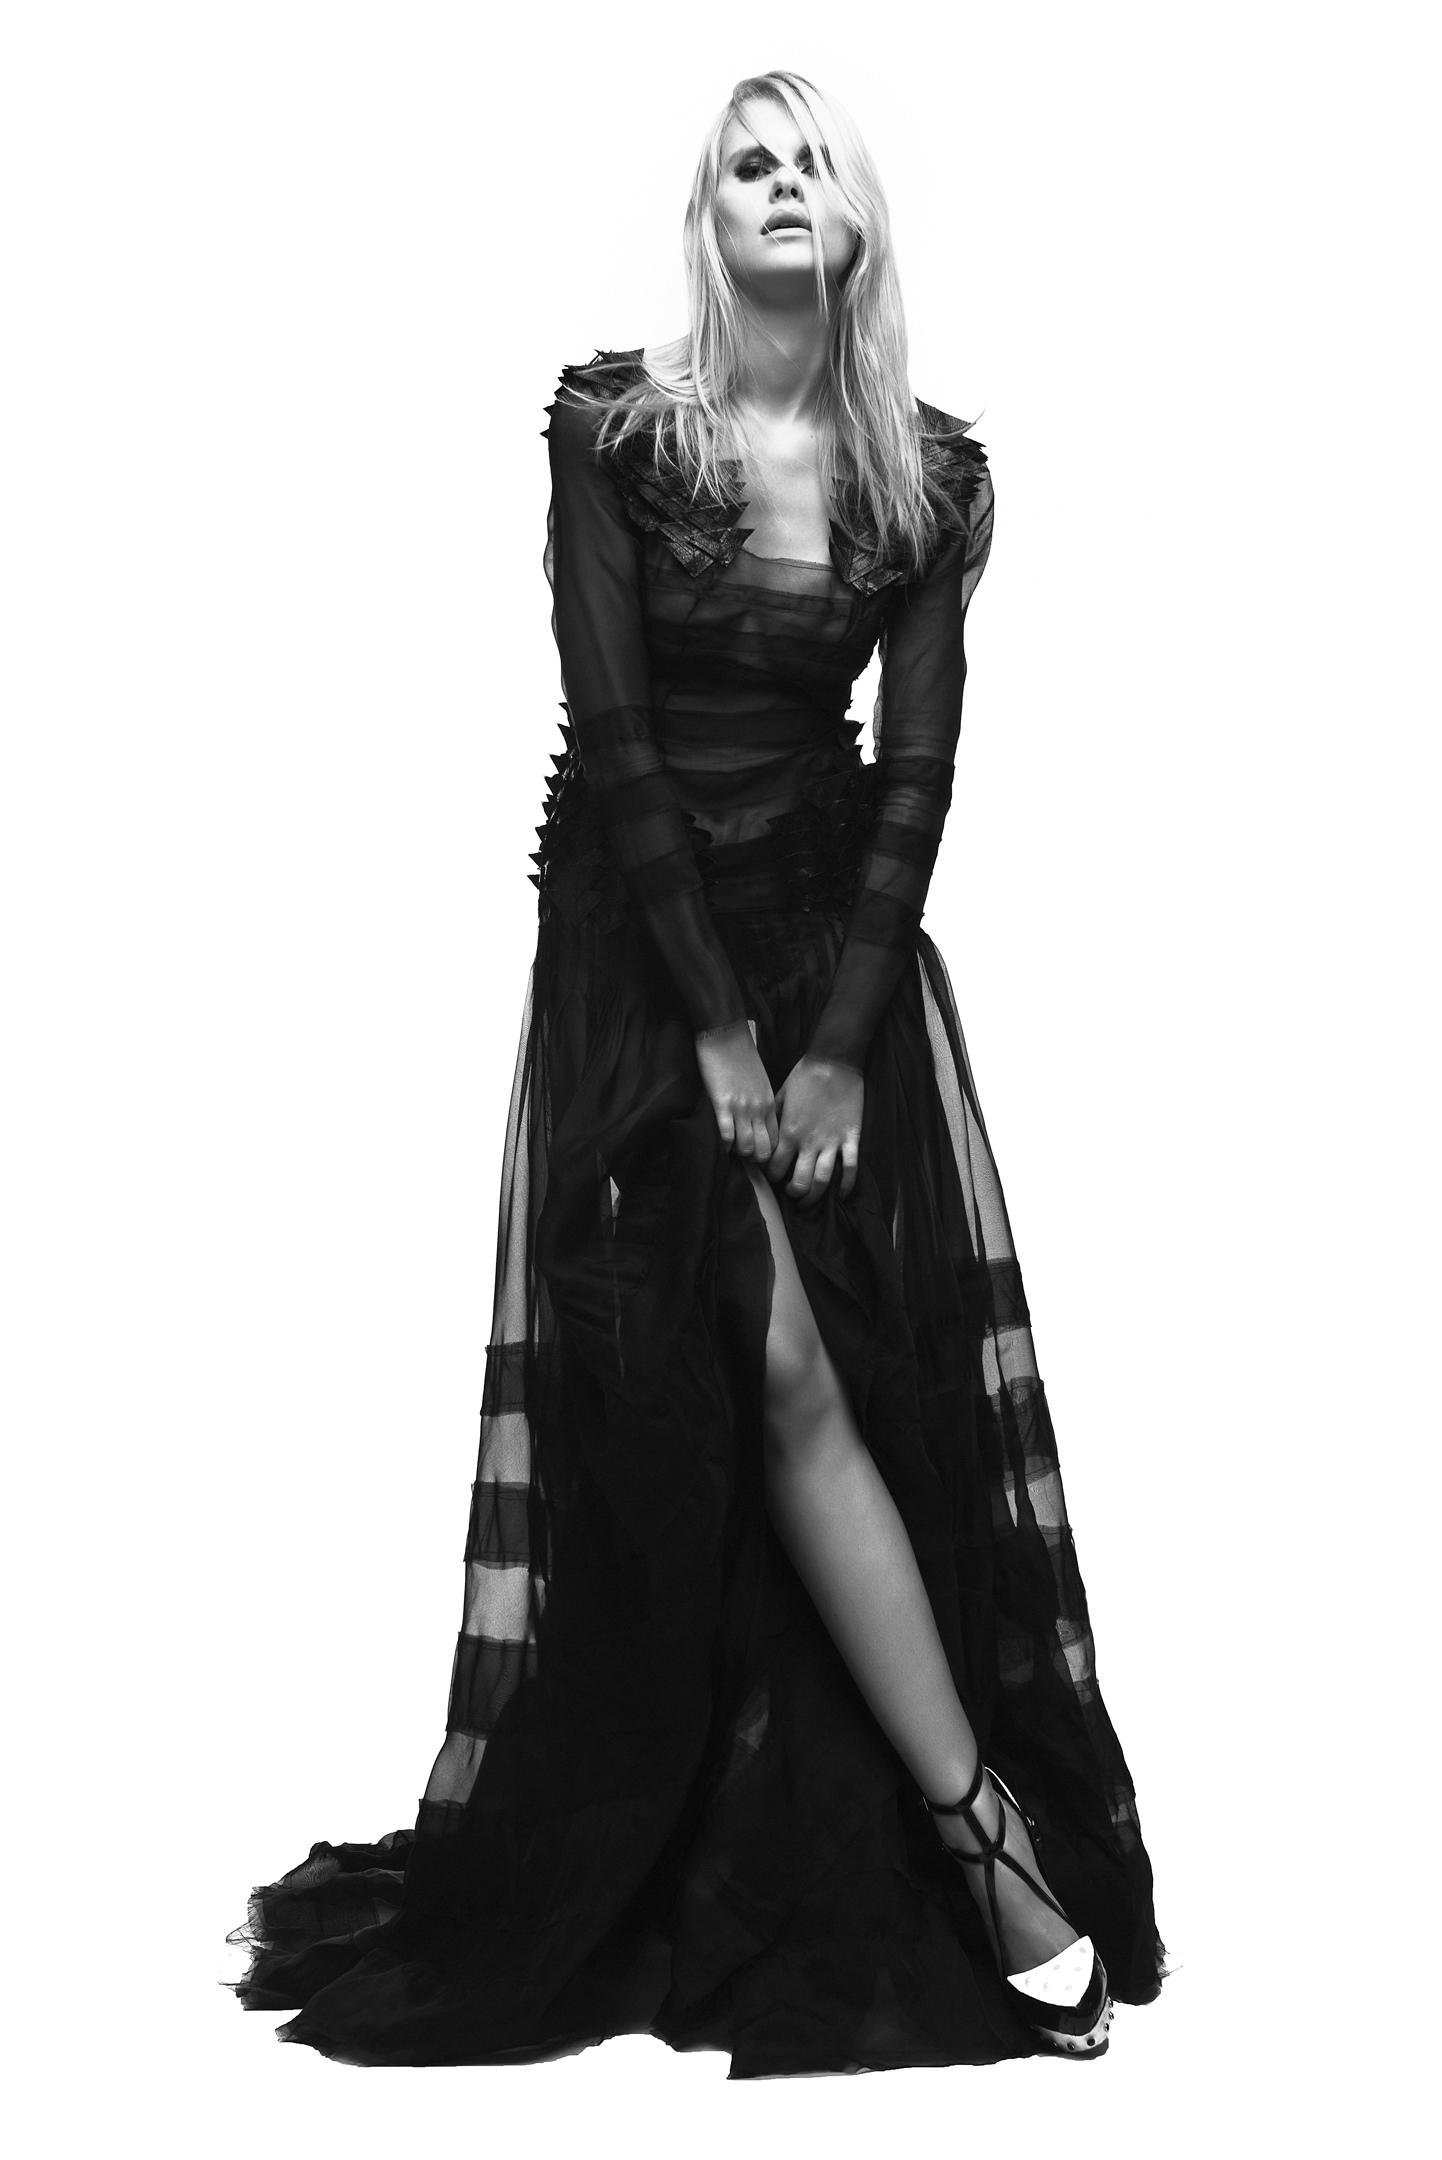 Maleficent-by-ANNA-BAZHANOVA-dh-14